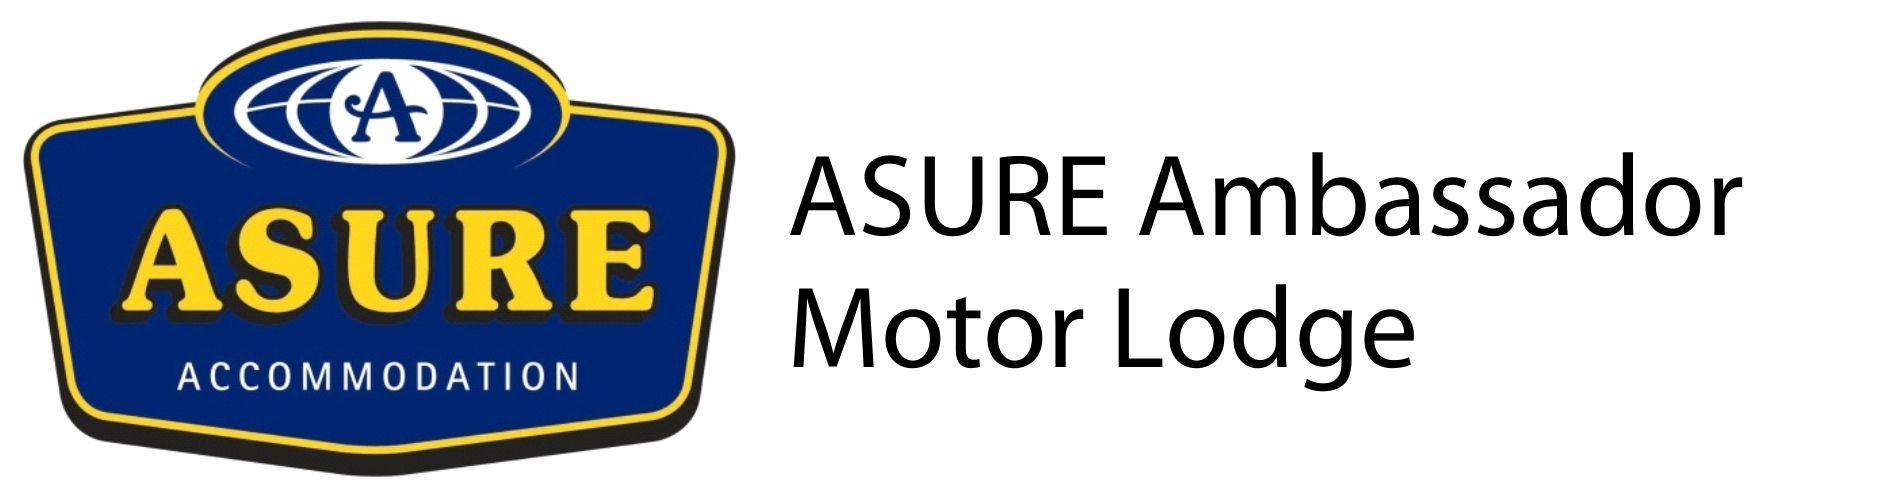 ASURE Ambassador Motor Lodge